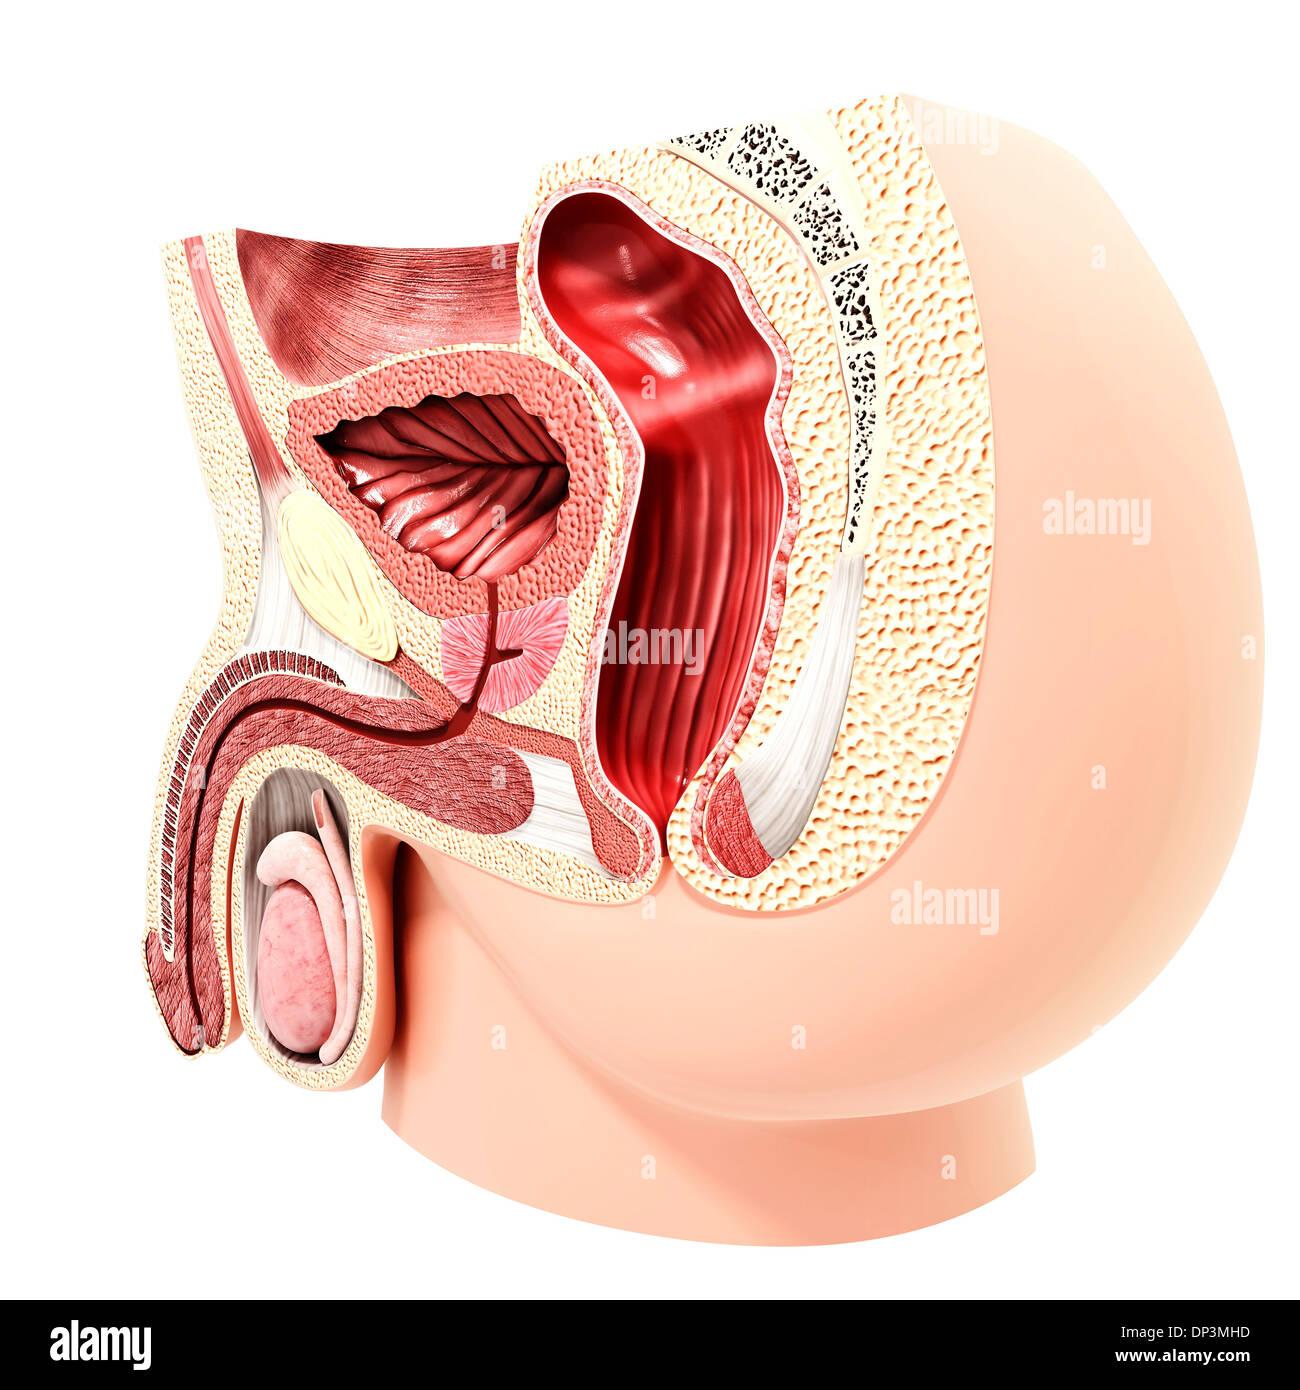 Male Urinary System Artwork Stock Photo 65235561 Alamy